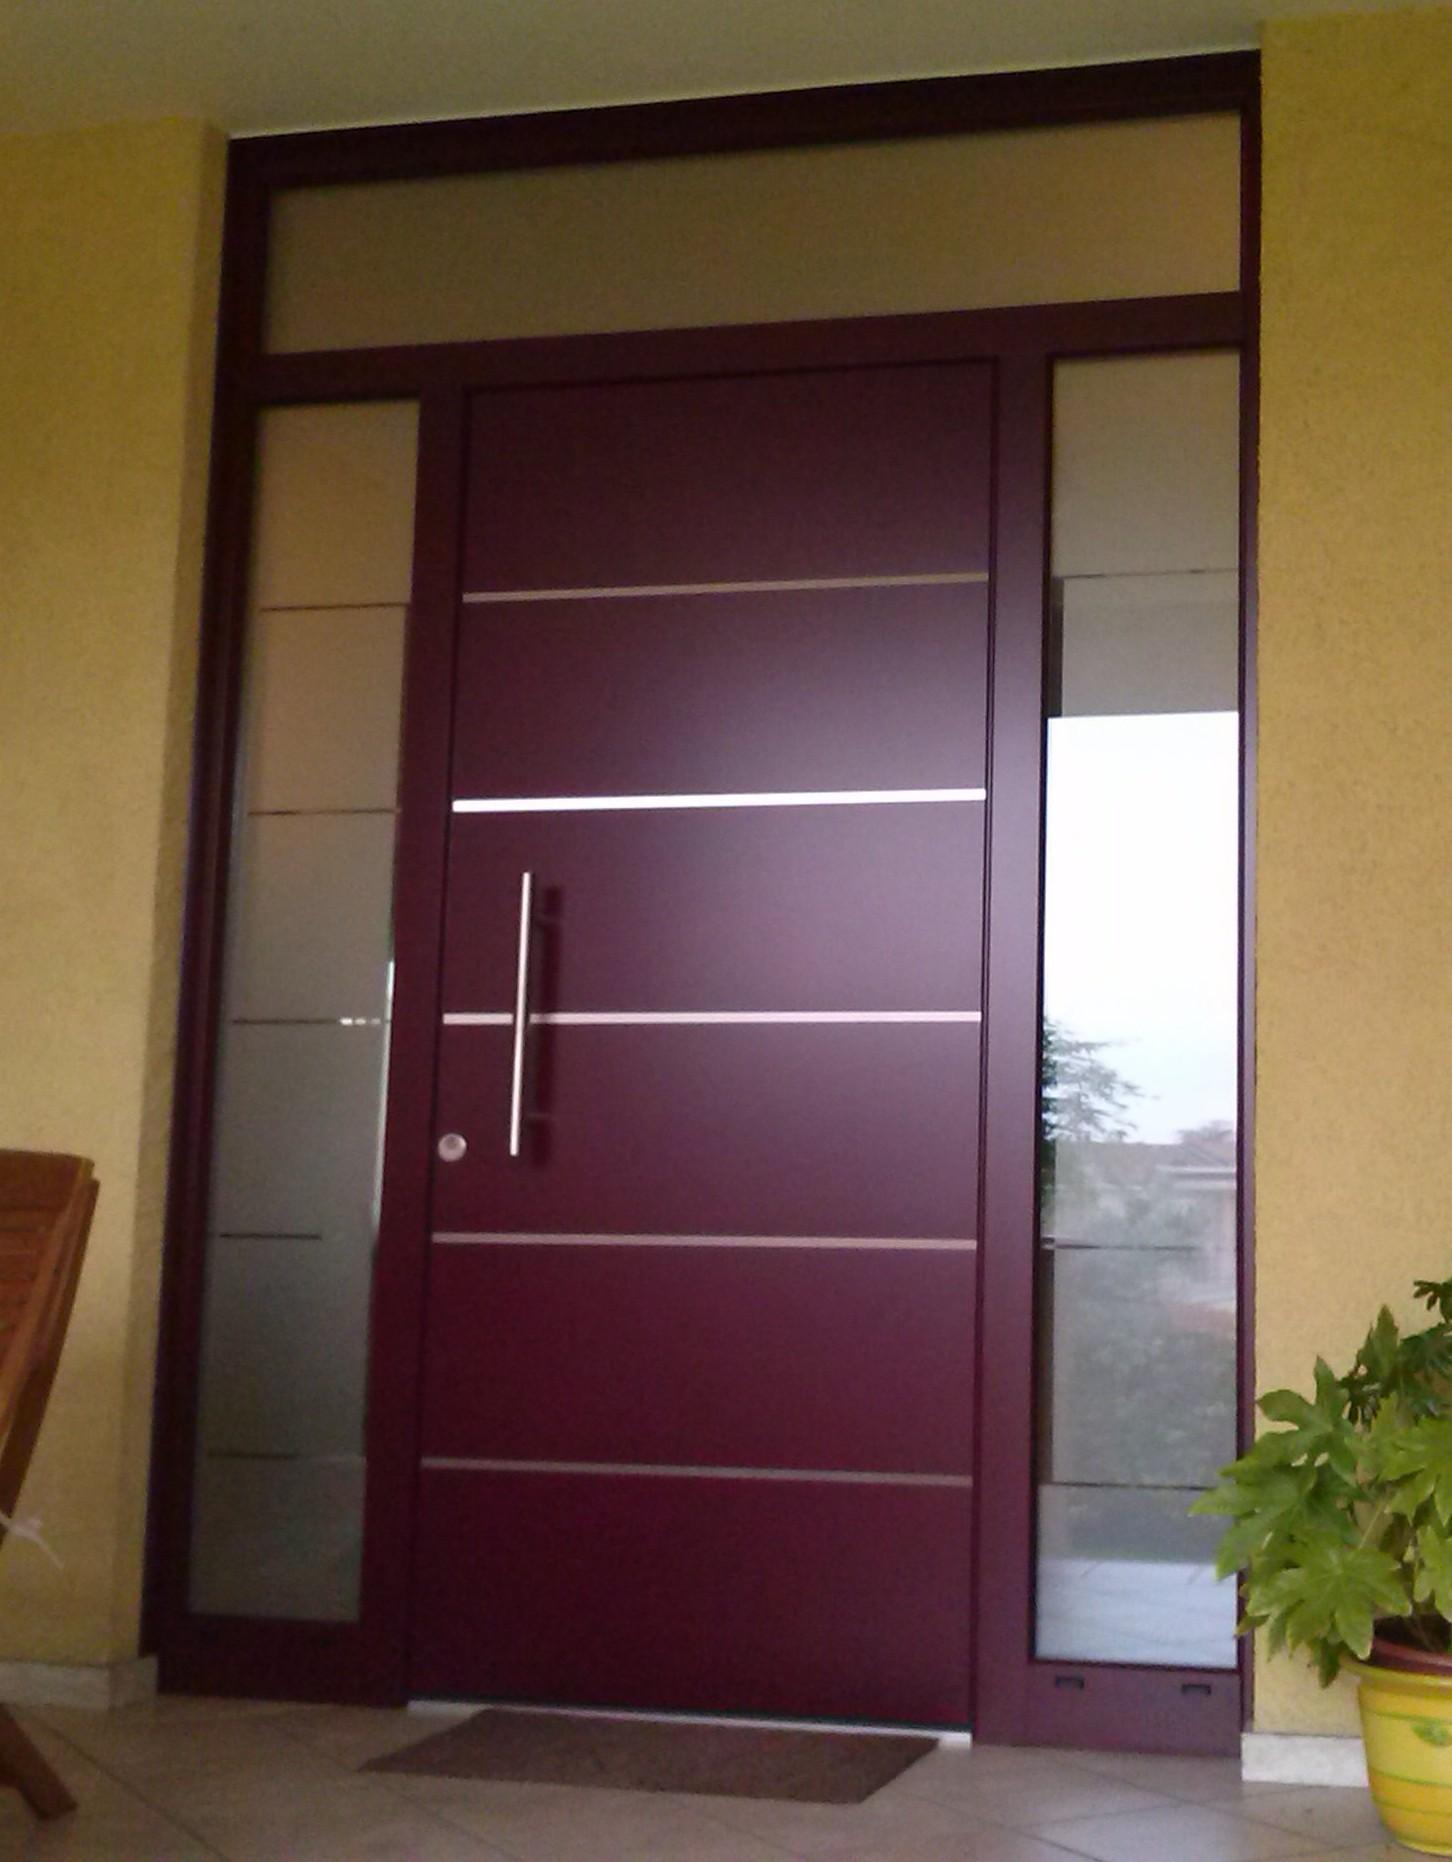 Showroom porte finestre giambo a verbania - Ingresso garage ...